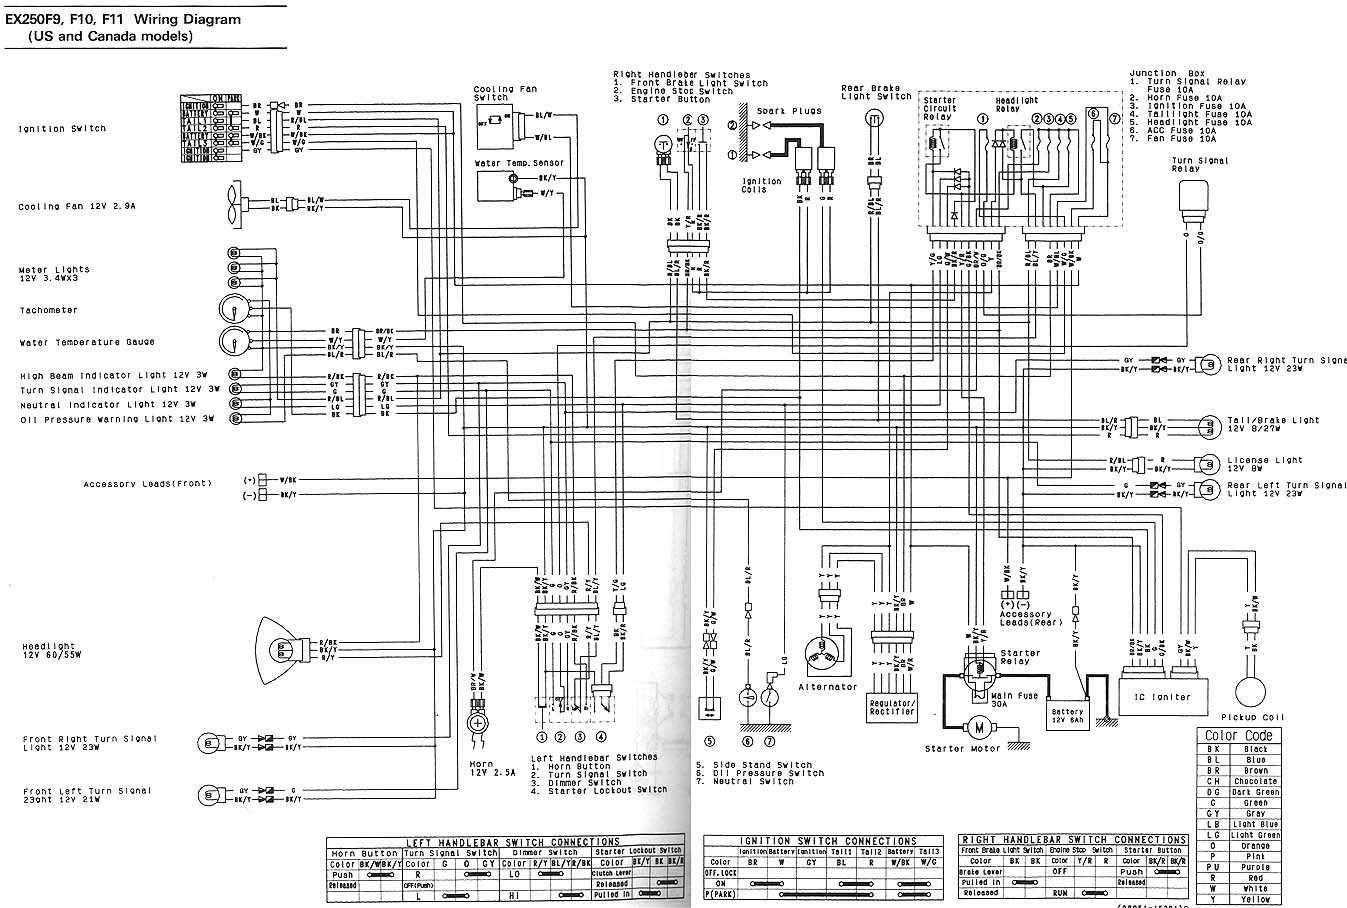 DIAGRAM] 1995 Zx 600 Fuse Box Diagram - Label Bone Diagram List  harbor.mon1erinstrument.frmon1erinstrument.fr